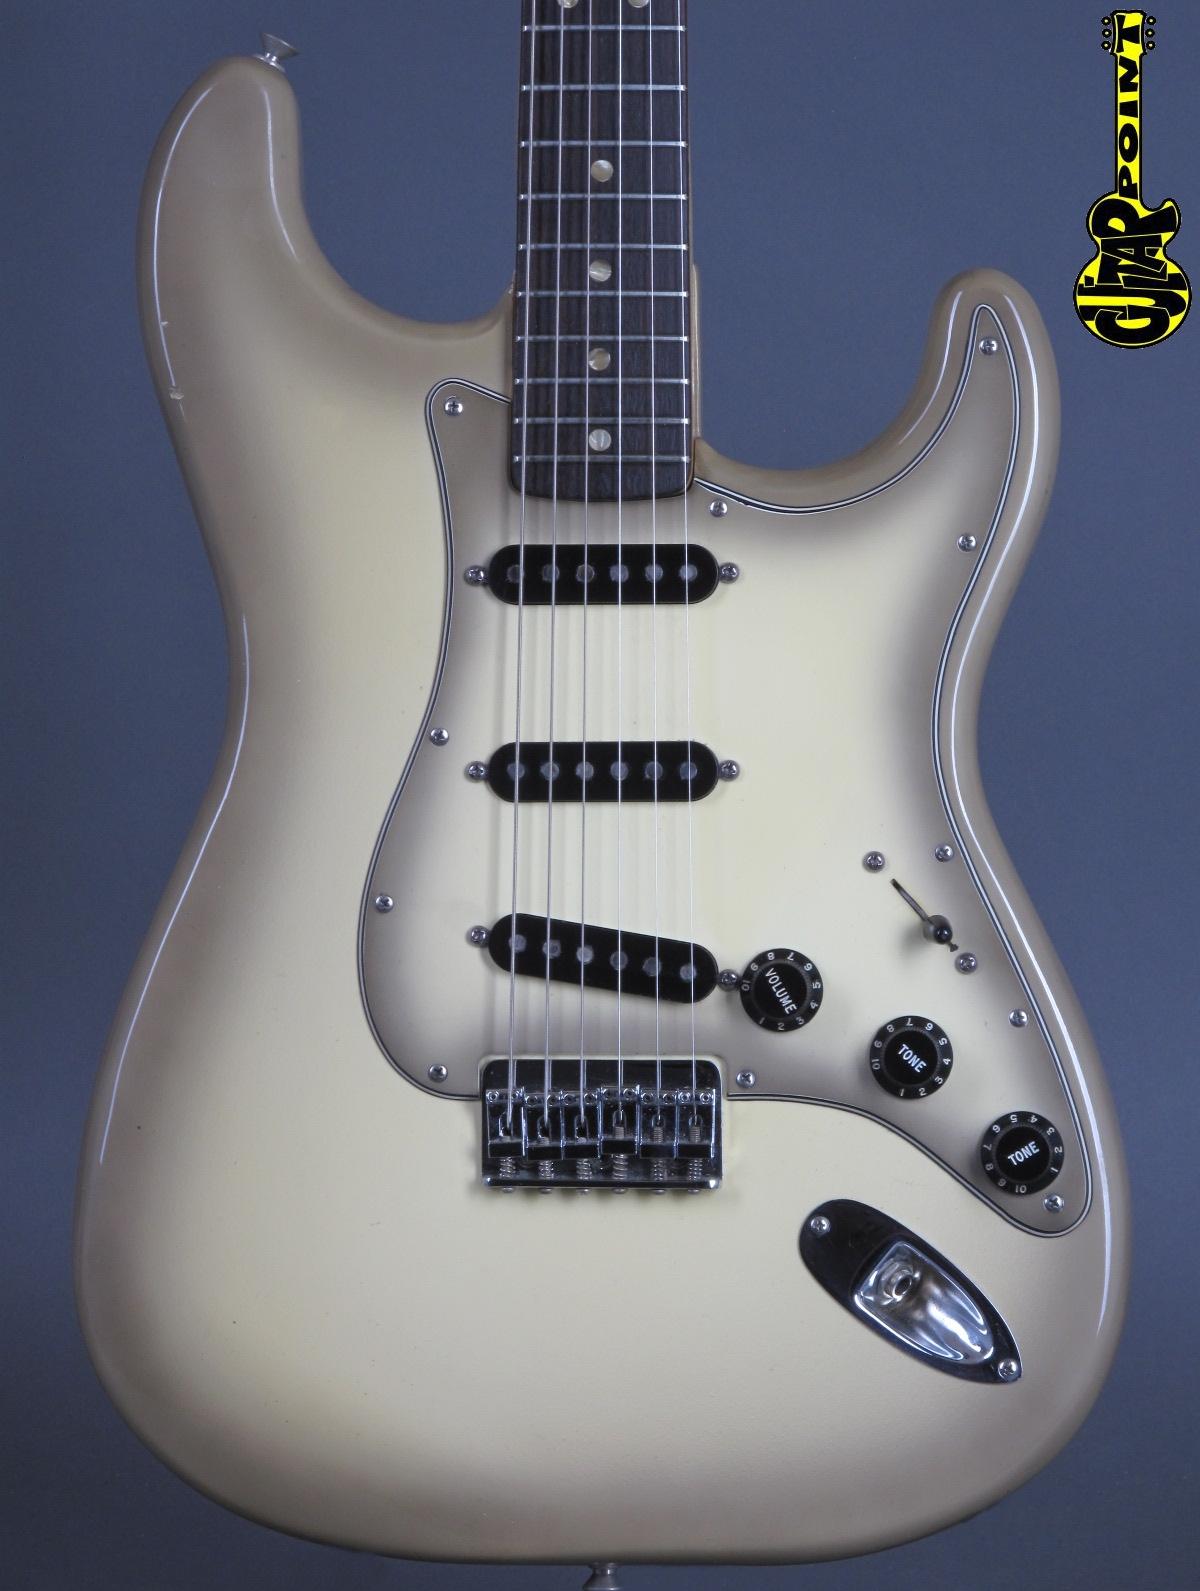 1978 Fender Stratocaster - Antigua finish